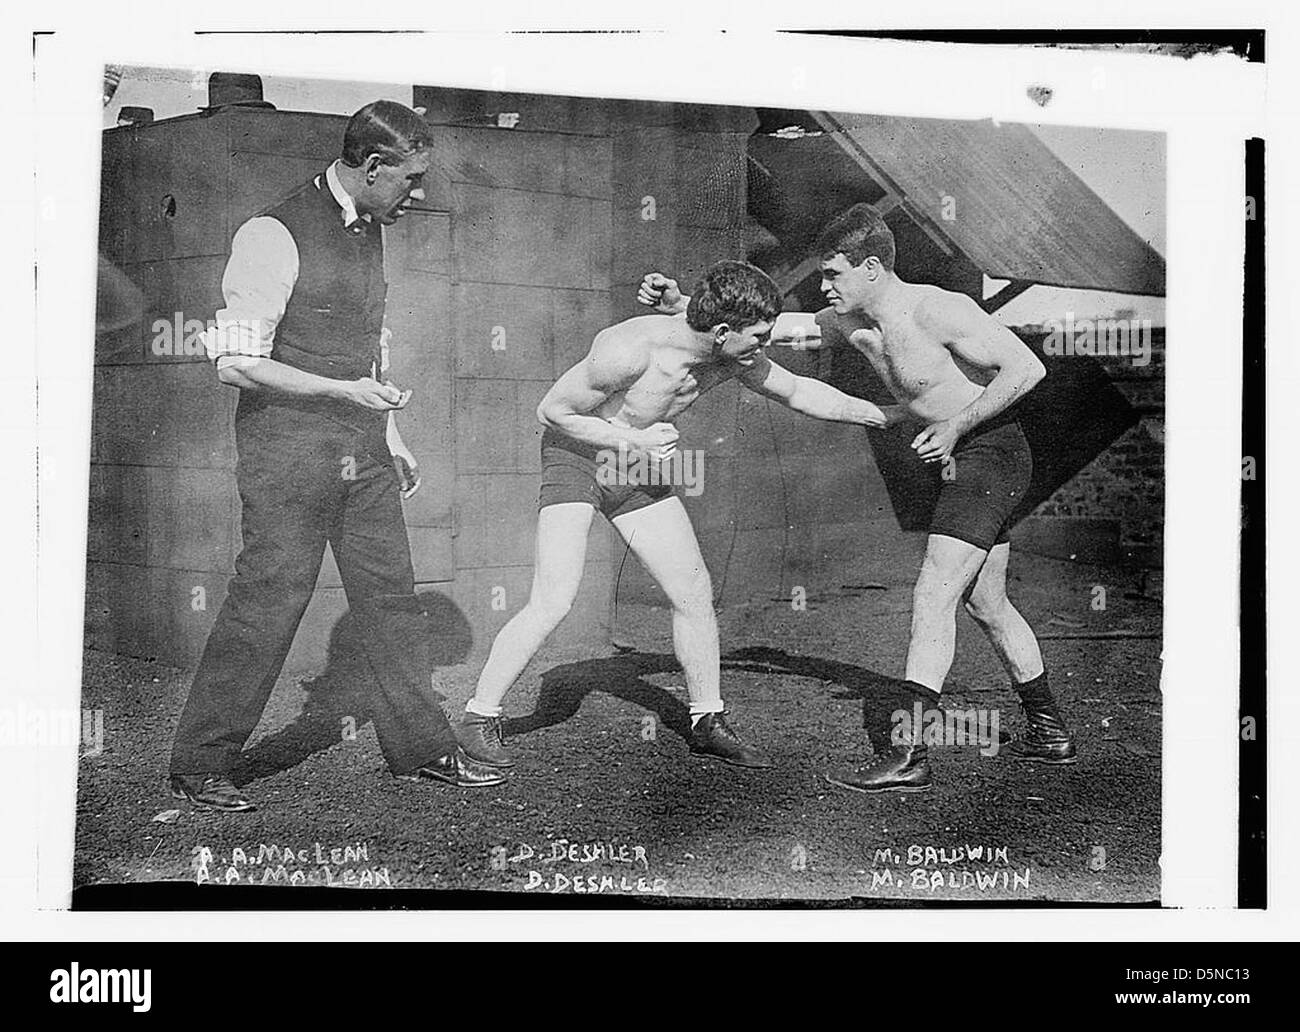 A.A. MacLean, D. Deshler, M. Baldwin (LOC) Imagen De Stock